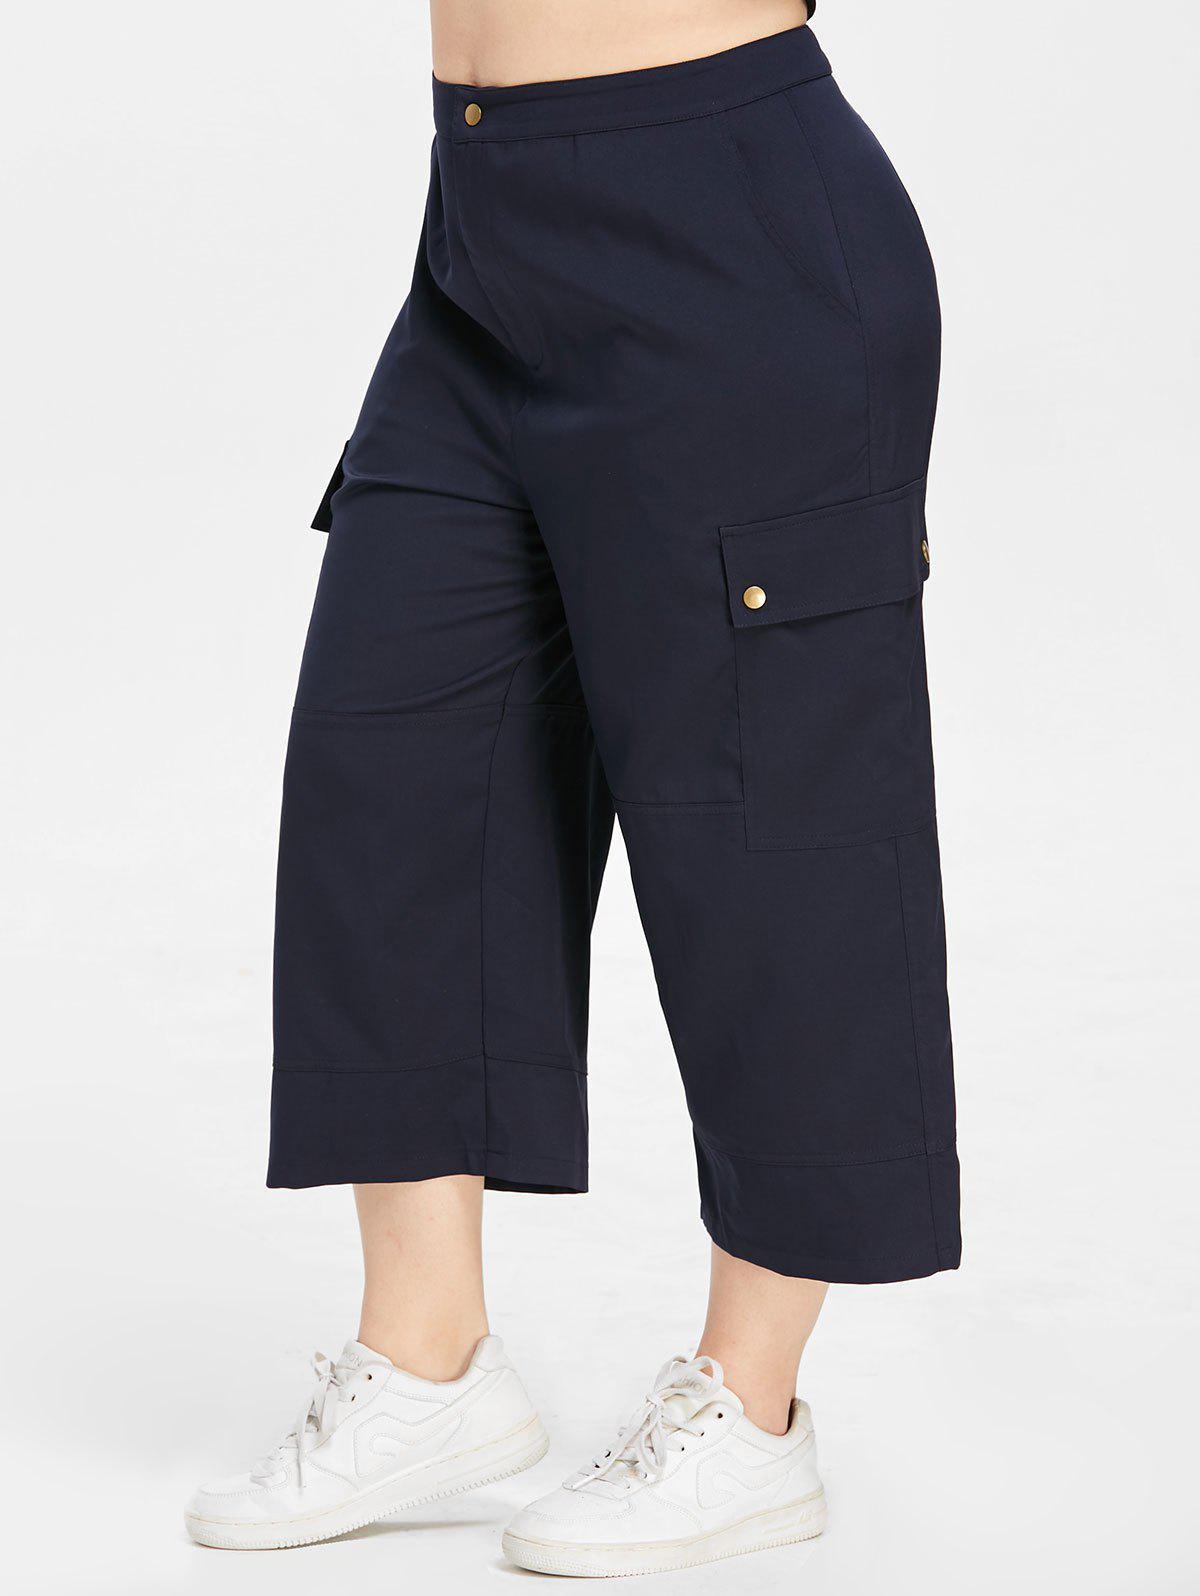 Pantalon à Jambe Large de Grande Taille - ZAFUL - Modalova